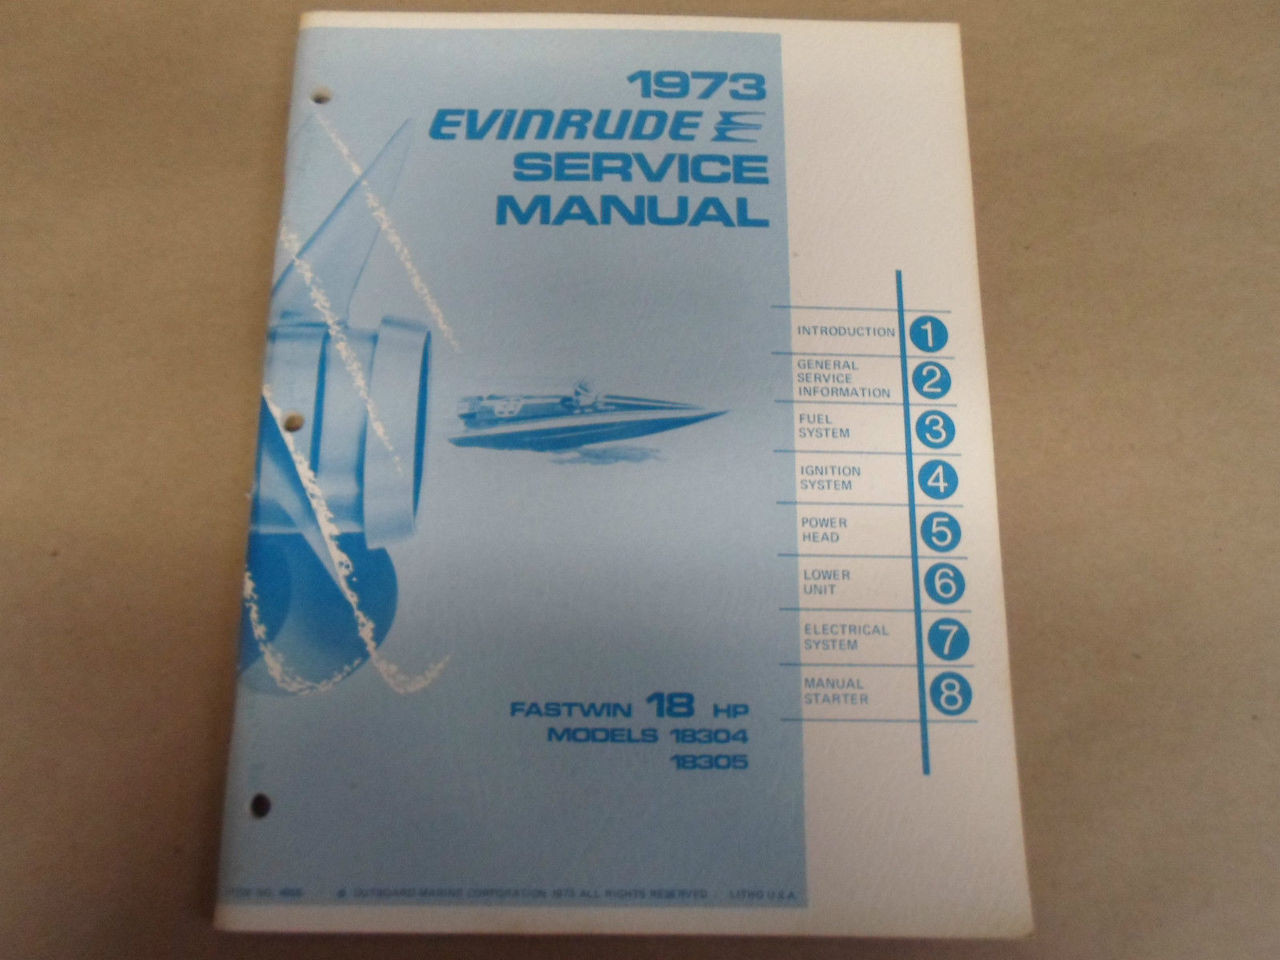 Array - 1973 evinrude service shop repair manual 18 hp 18304 18305      rh   carboagez com